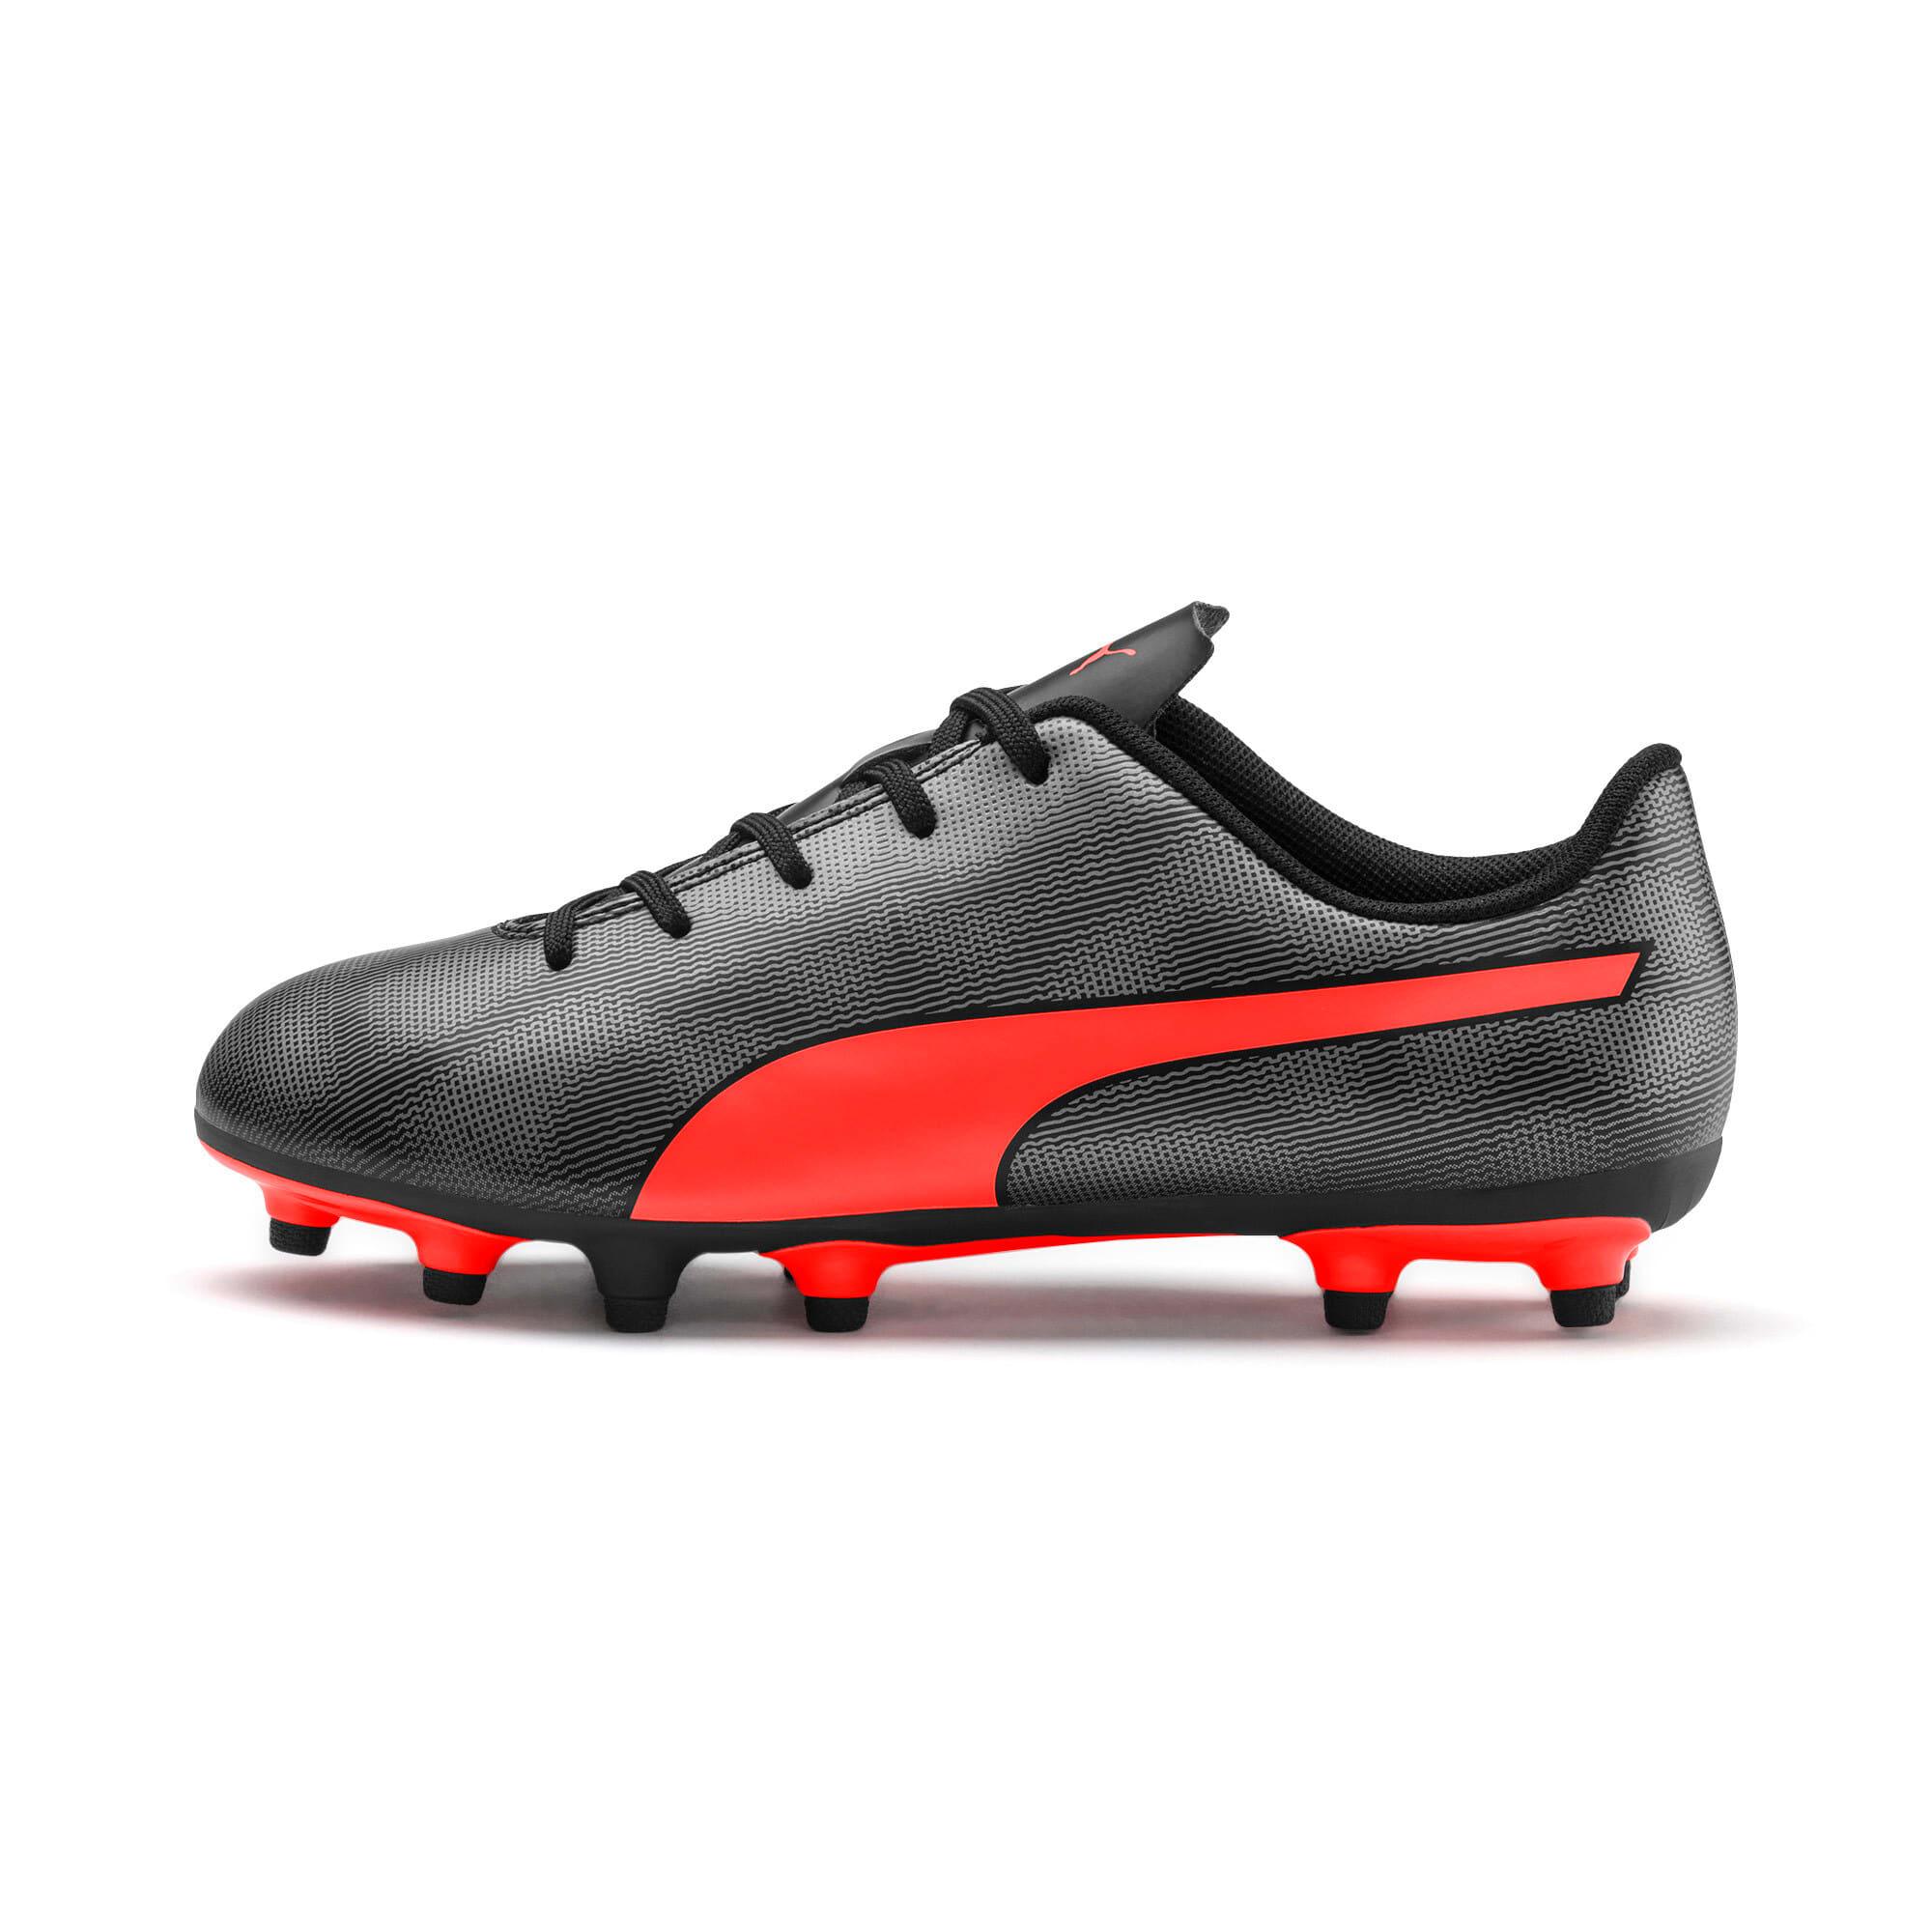 Thumbnail 1 of Rapido FG Boy's Soccer Cleats JR, Black-Nrgy Red-Aged Silver, medium